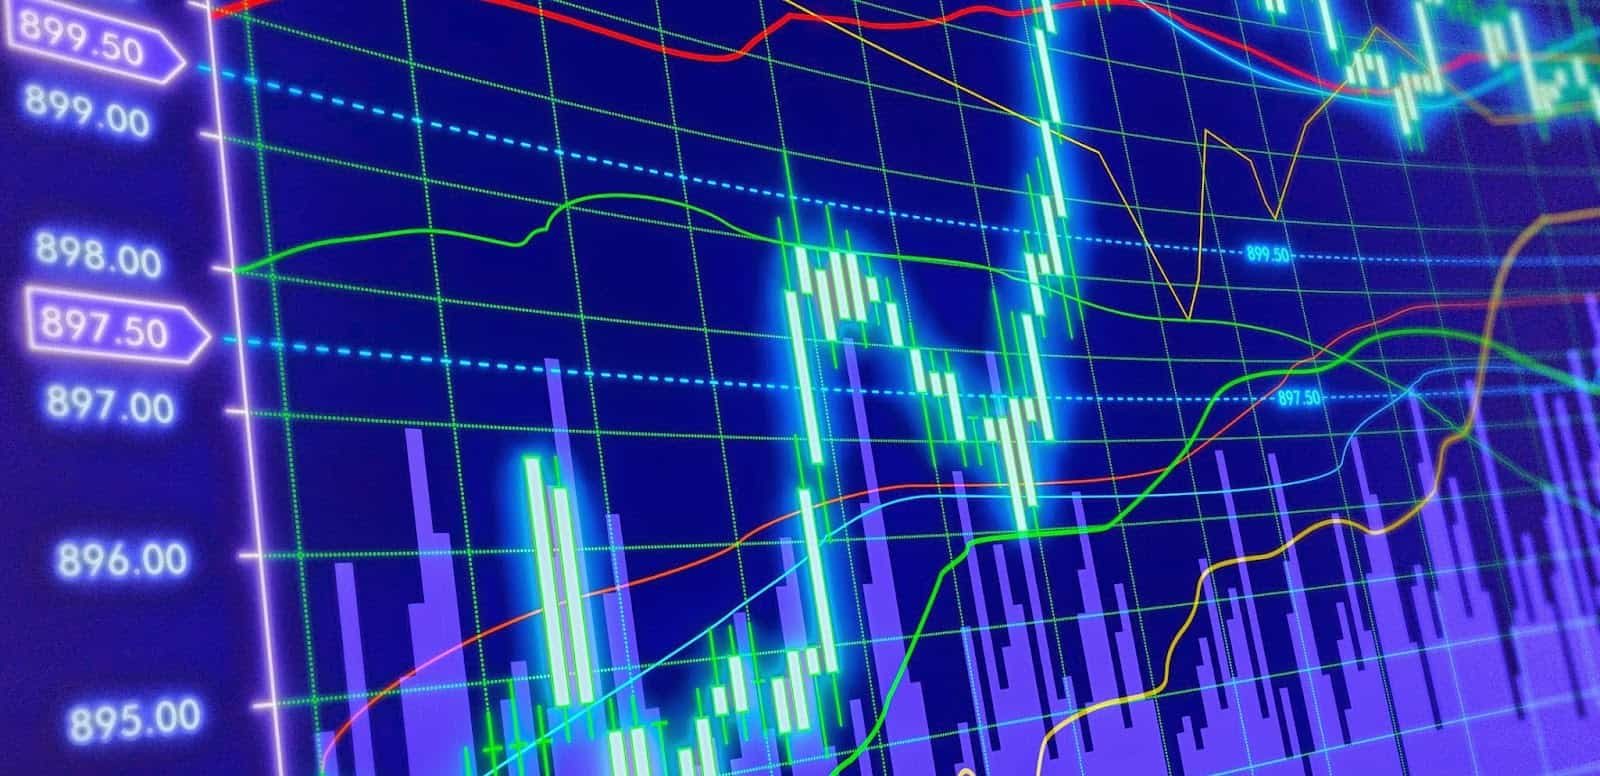 robo investidor trader - robo investidor trader é confiavel